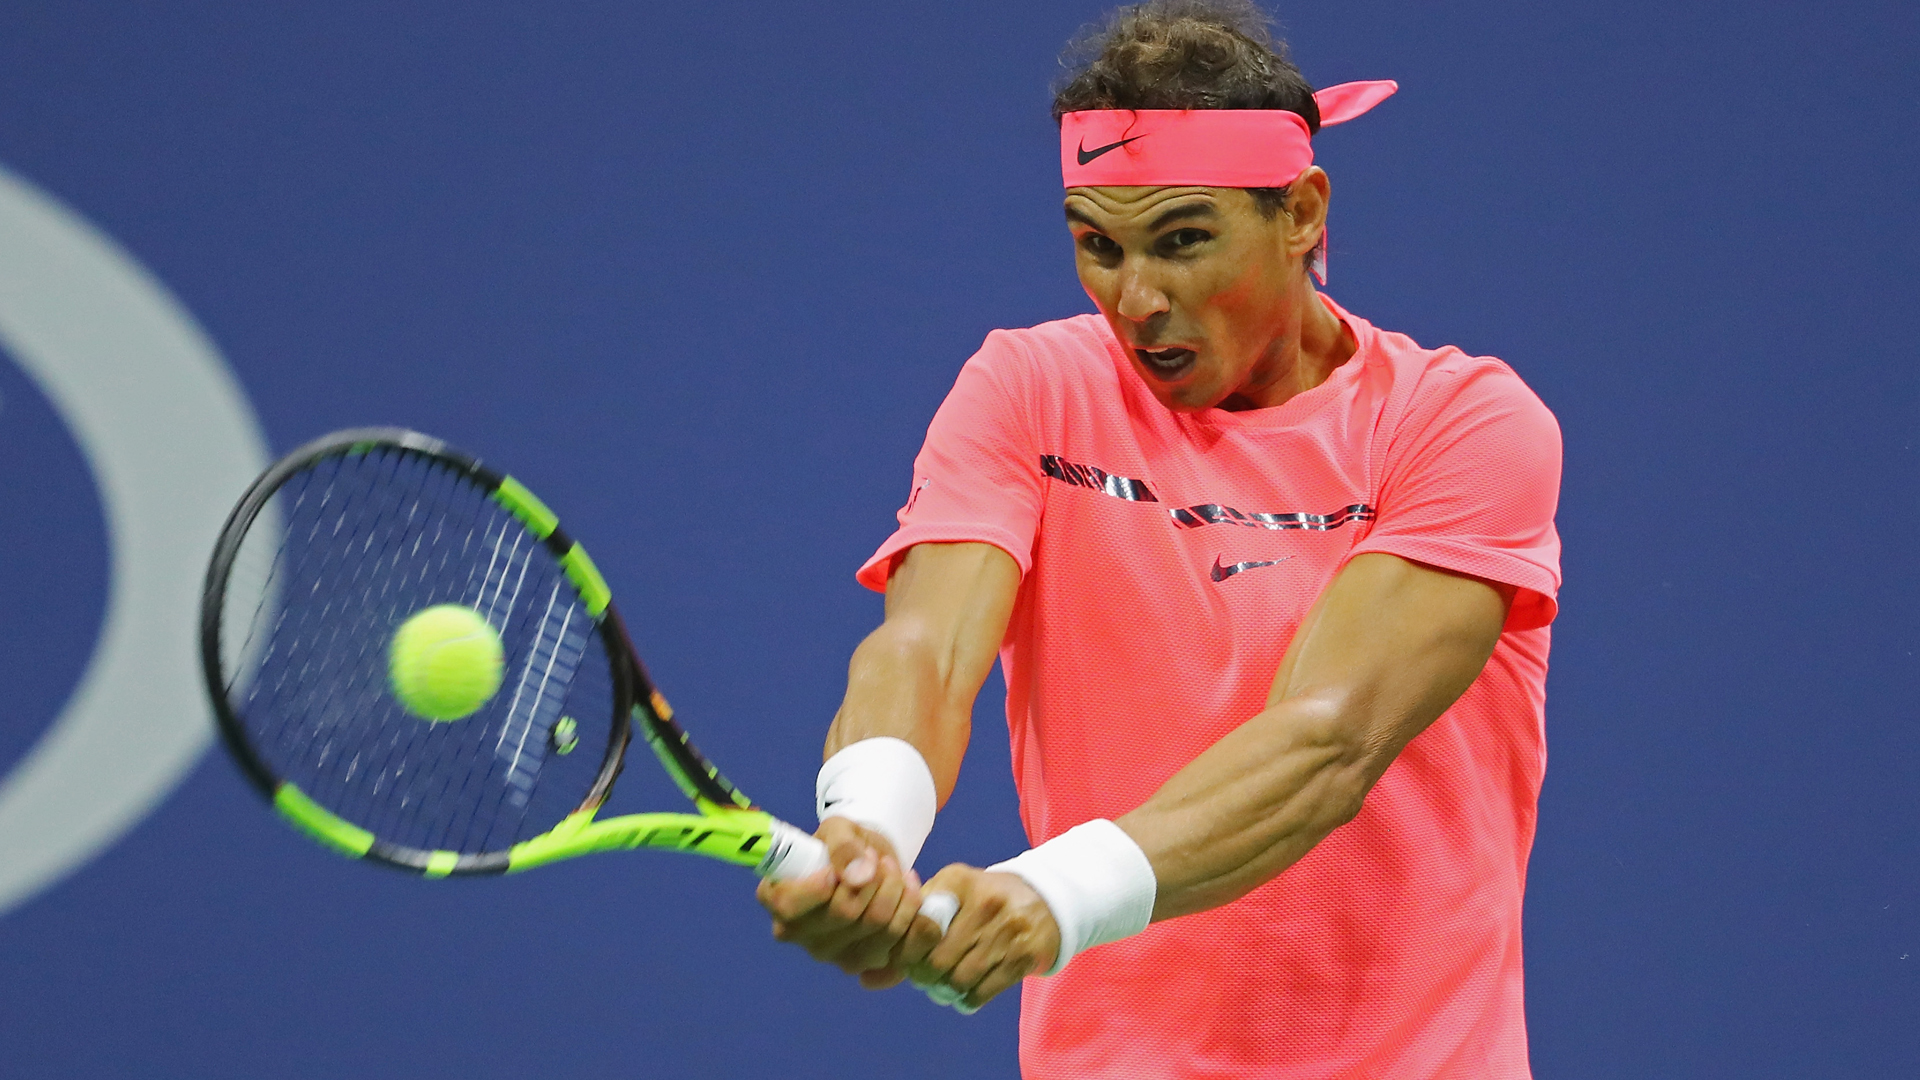 U.S. Open 2017: Rafael Nadal labels Andy Murray withdrawal timing as 'strange'